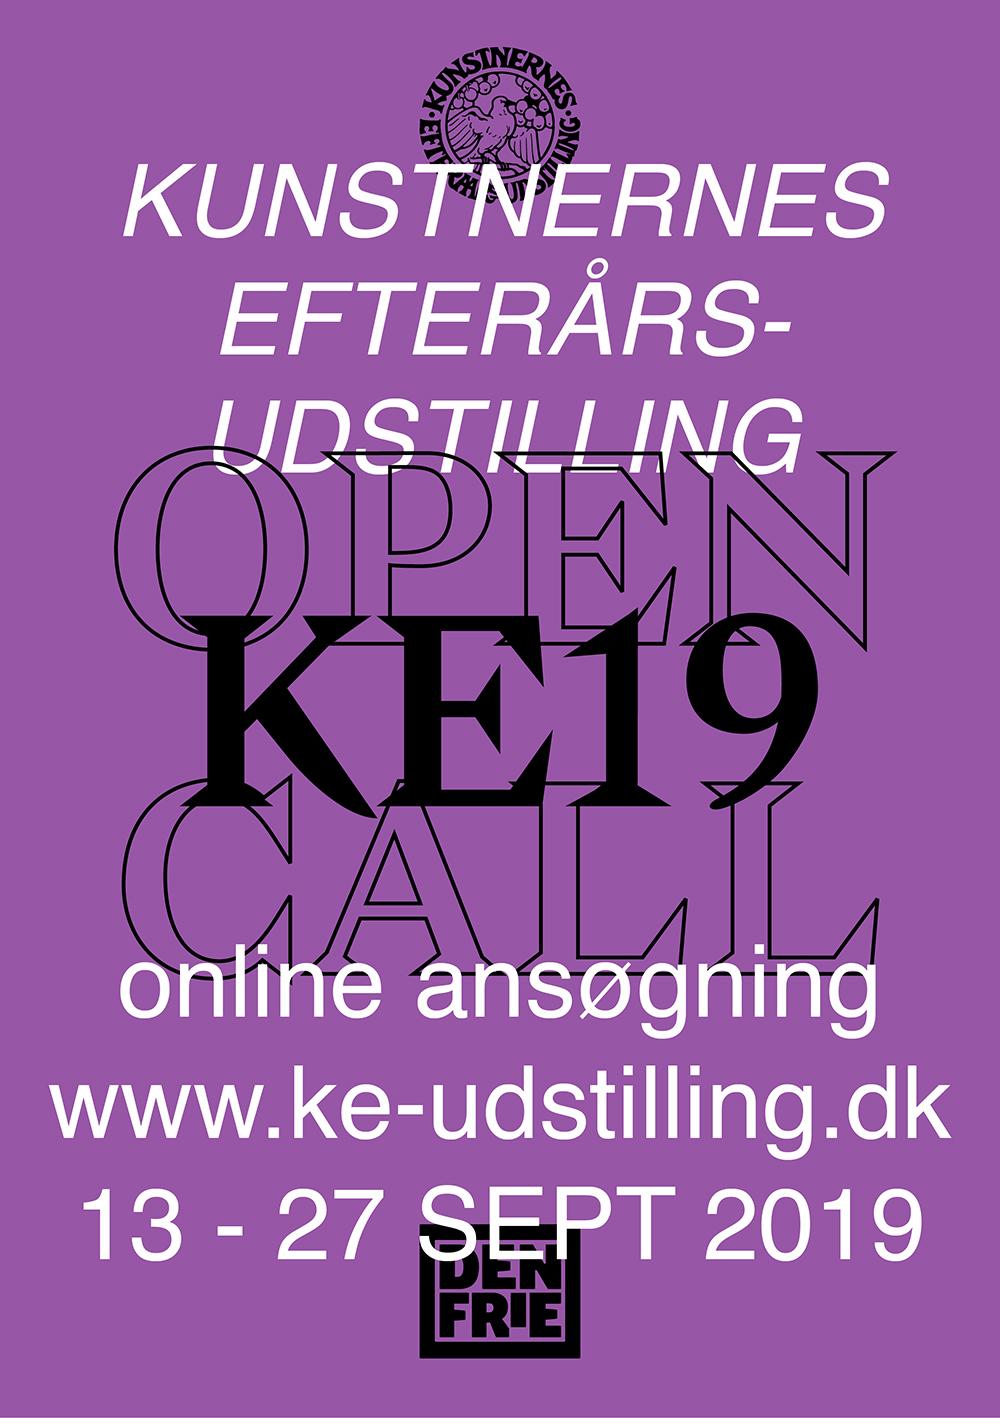 OpenCall-KE19.